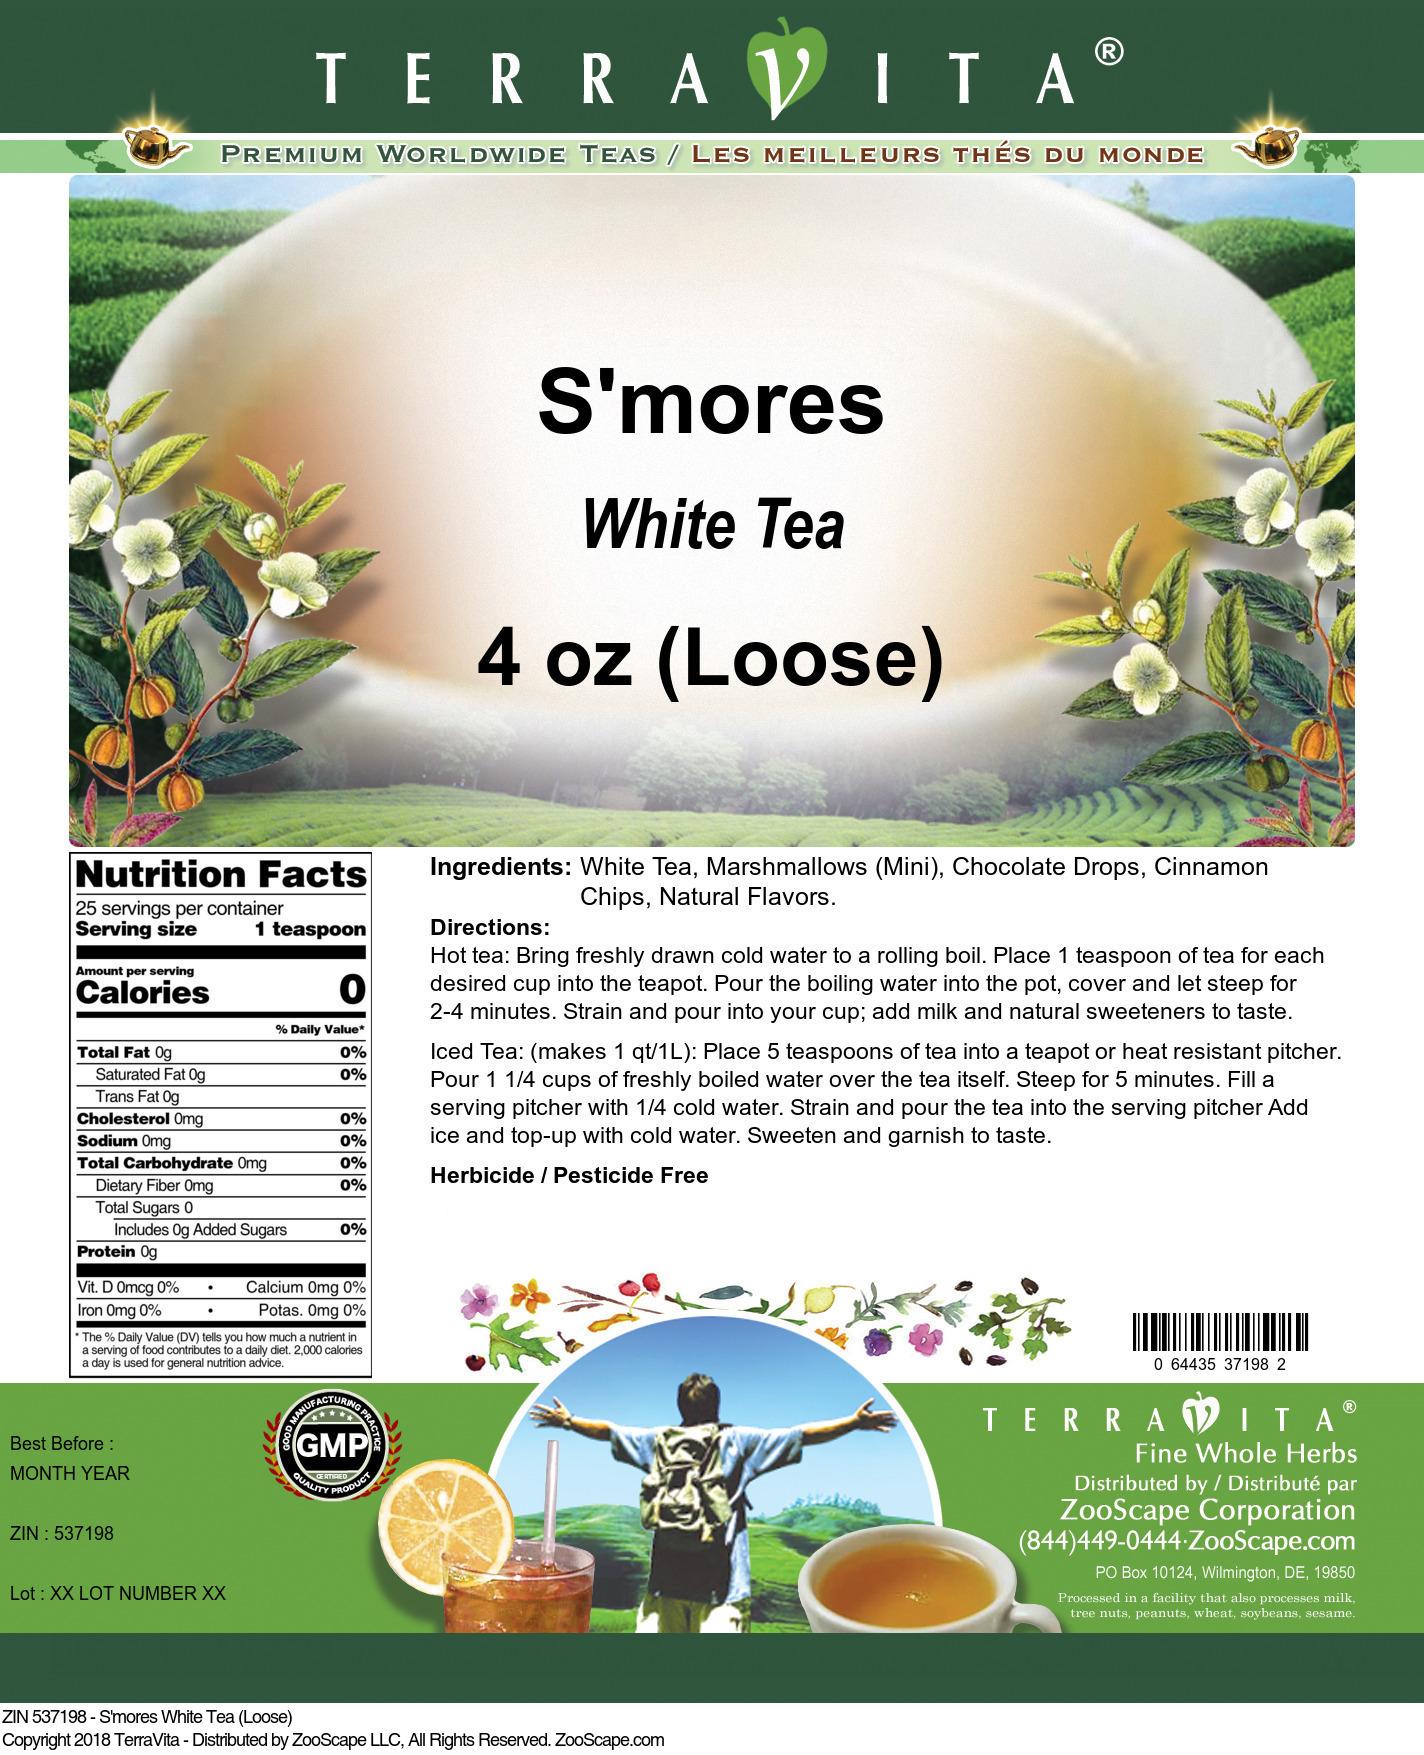 S'mores White Tea